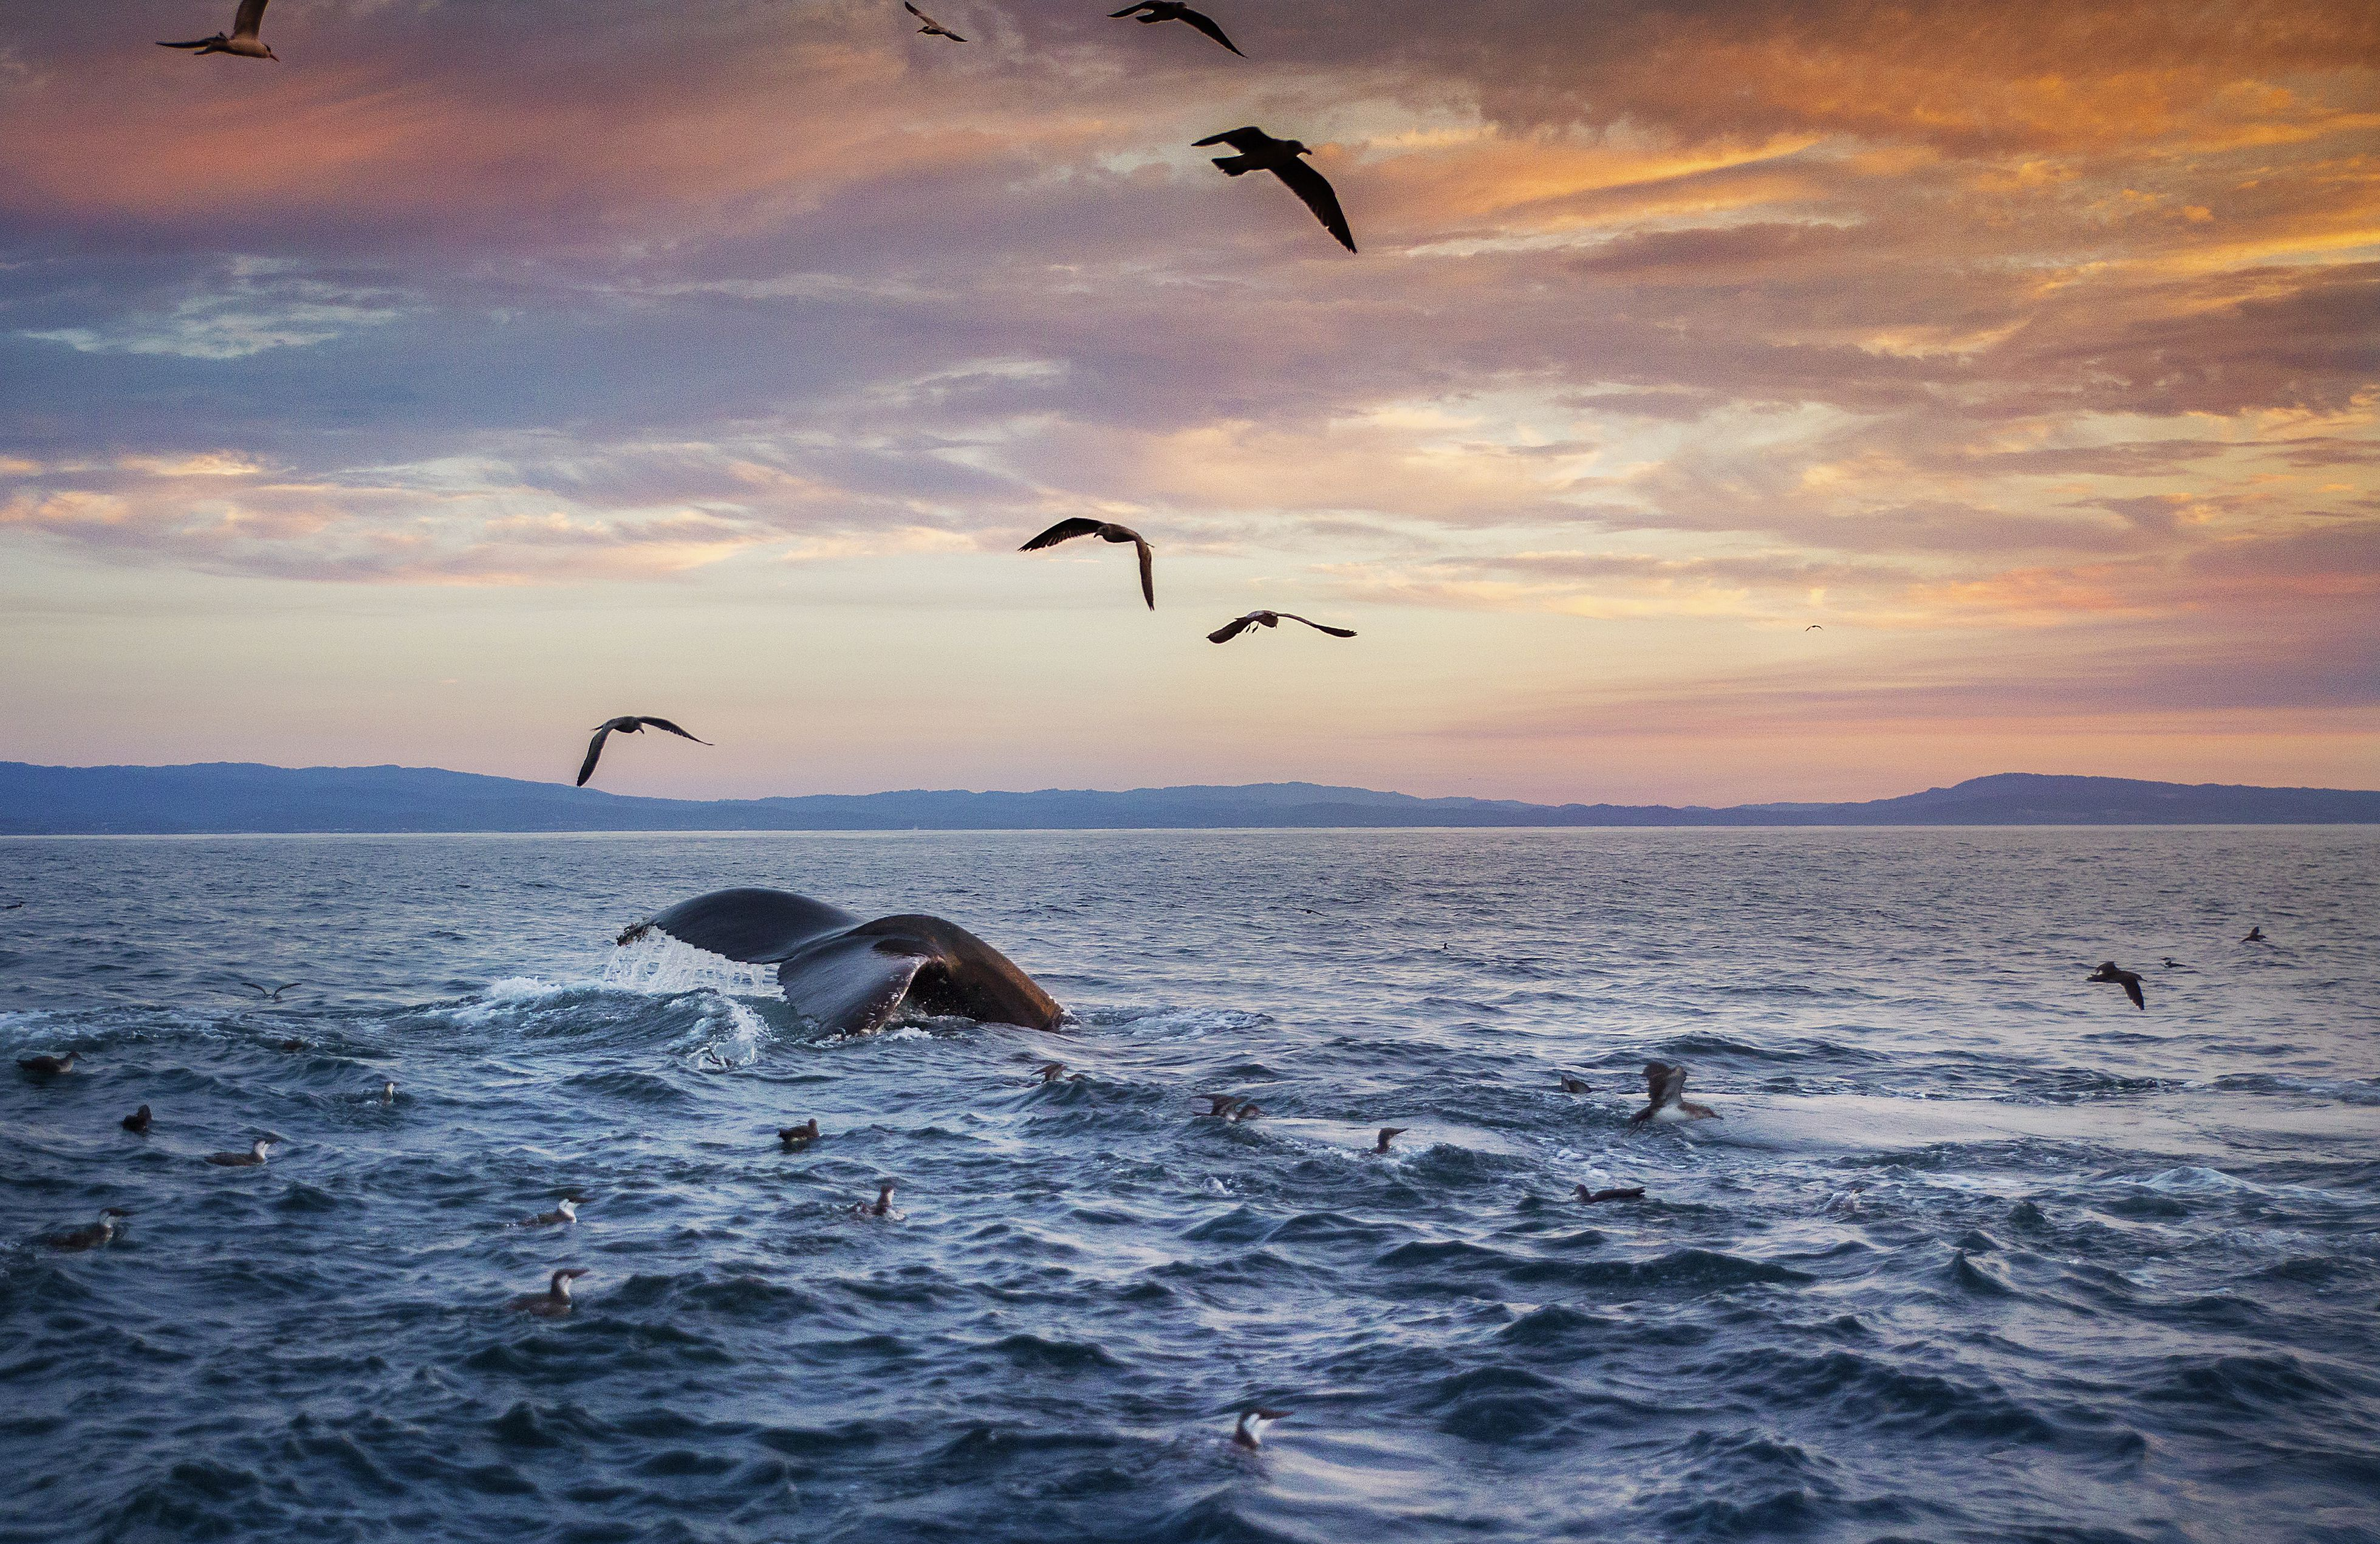 Whale Monterey Bay, California